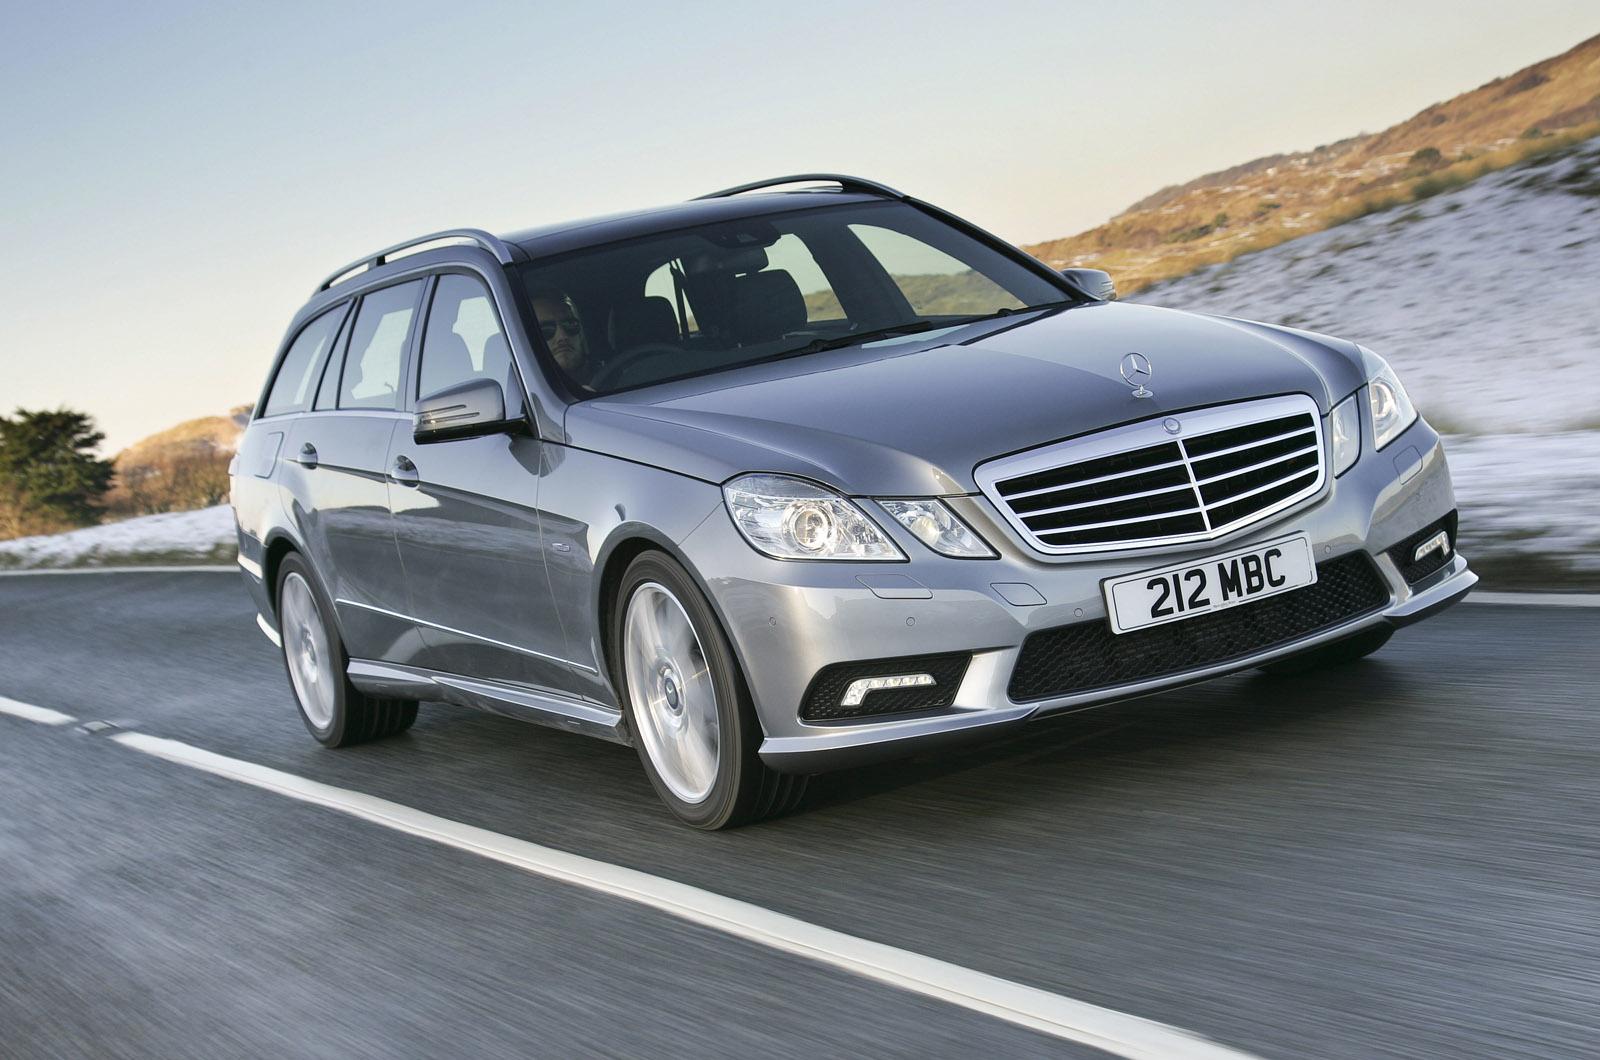 All Types mercedes e class estate 2010 : Mercedes-Benz E-Class E 350 CDI estate review | Autocar